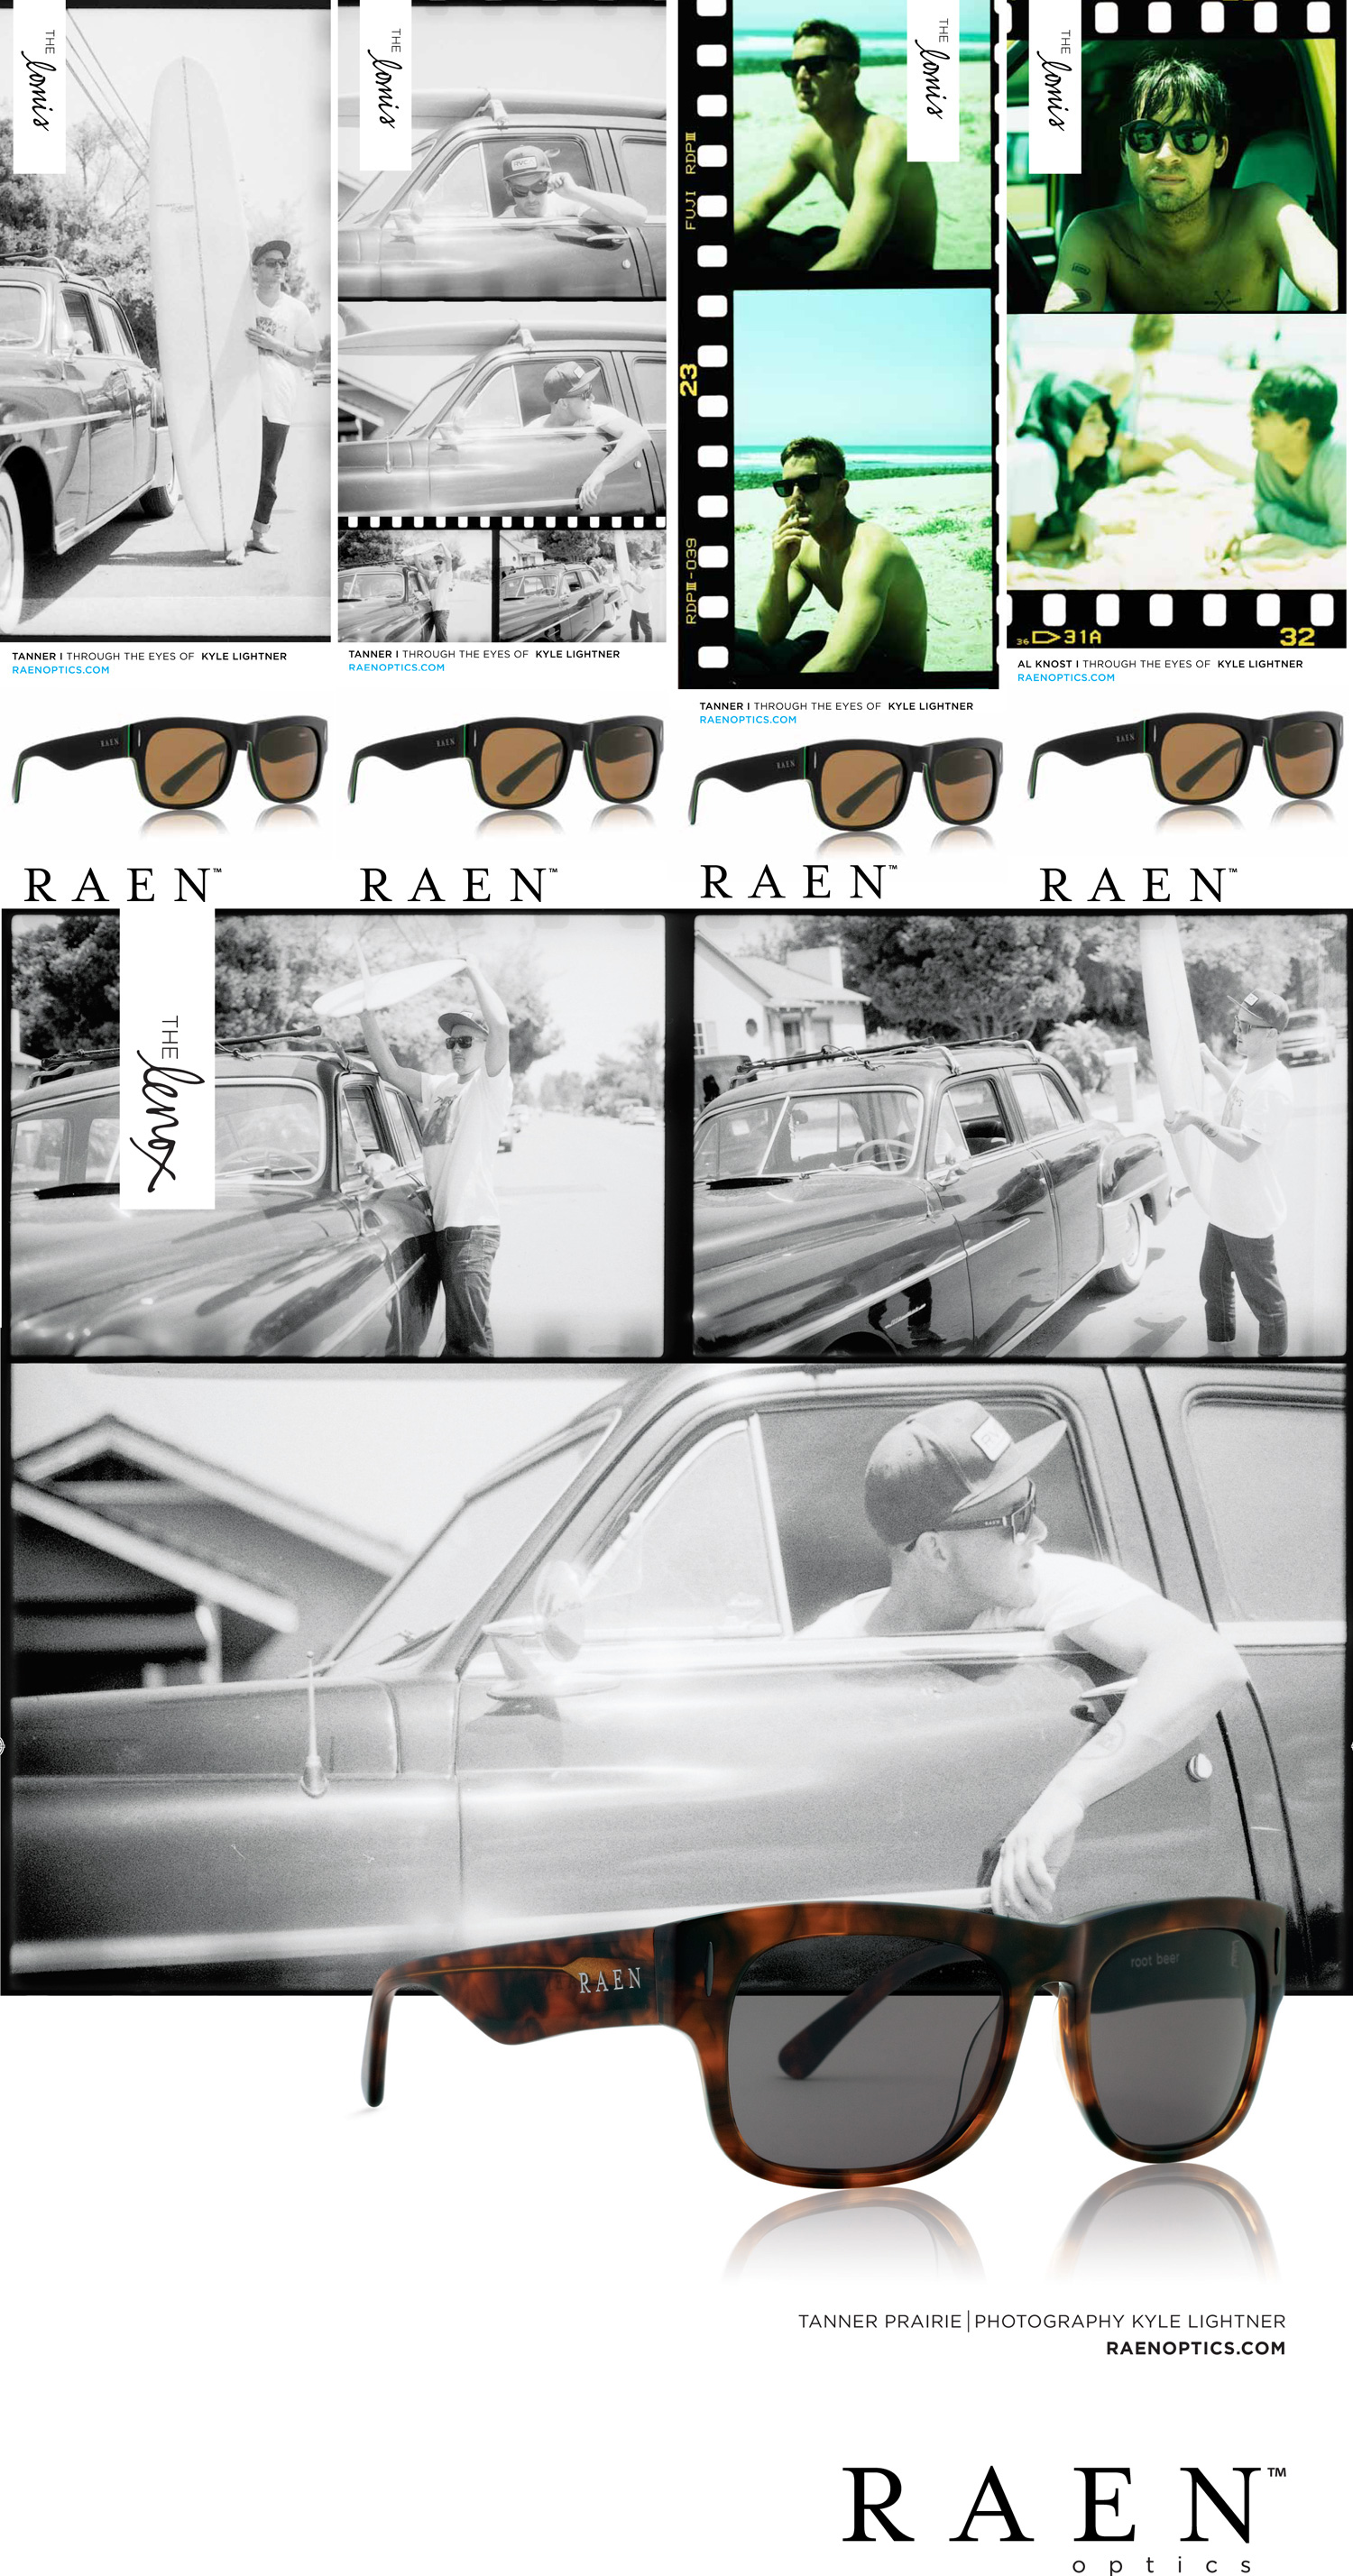 RAEN Optics Ads.